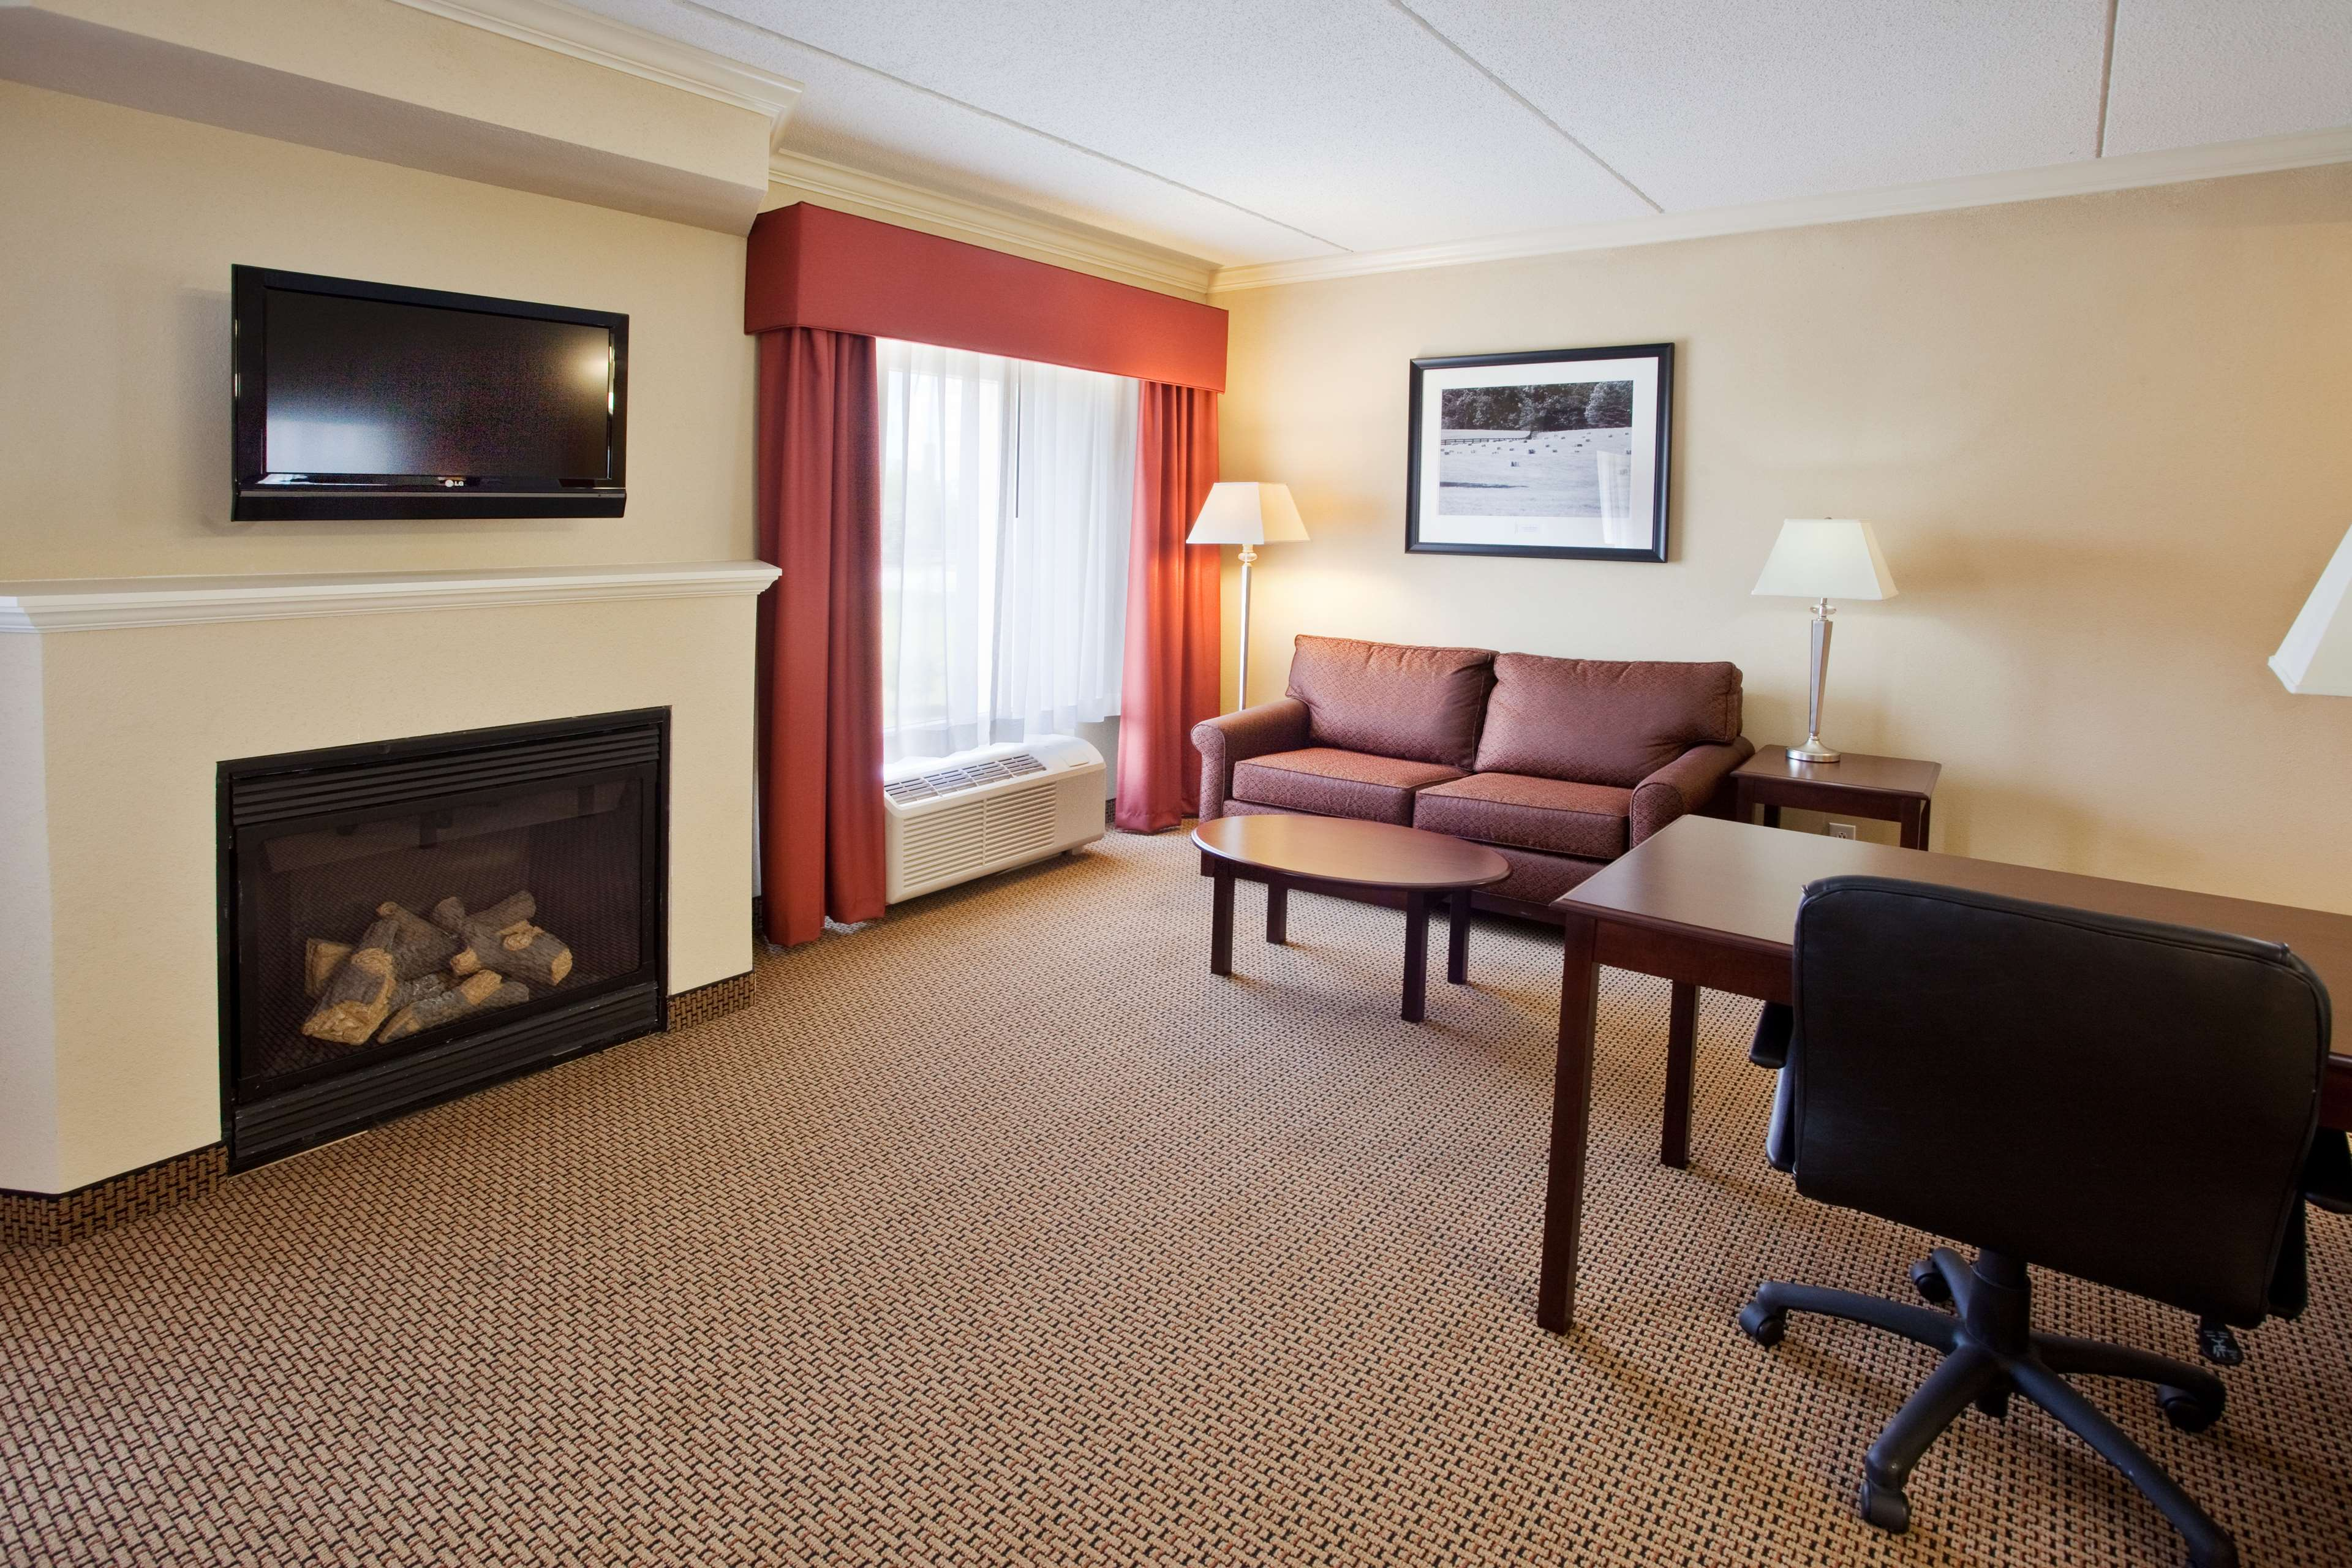 Hampton Inn & Suites Lanett-West Point image 41